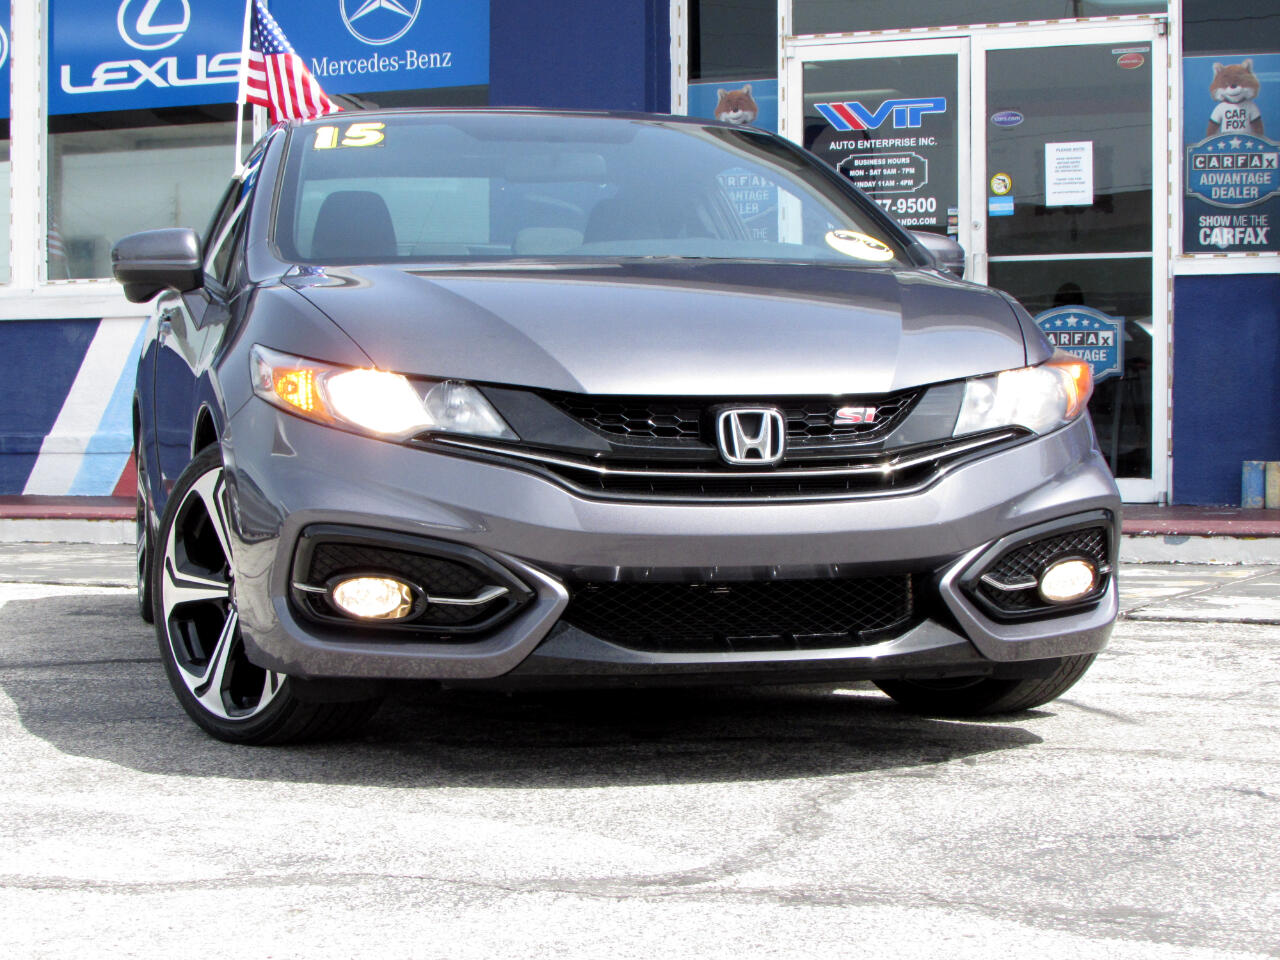 Honda Civic Coupe 2dr Man Si 2015